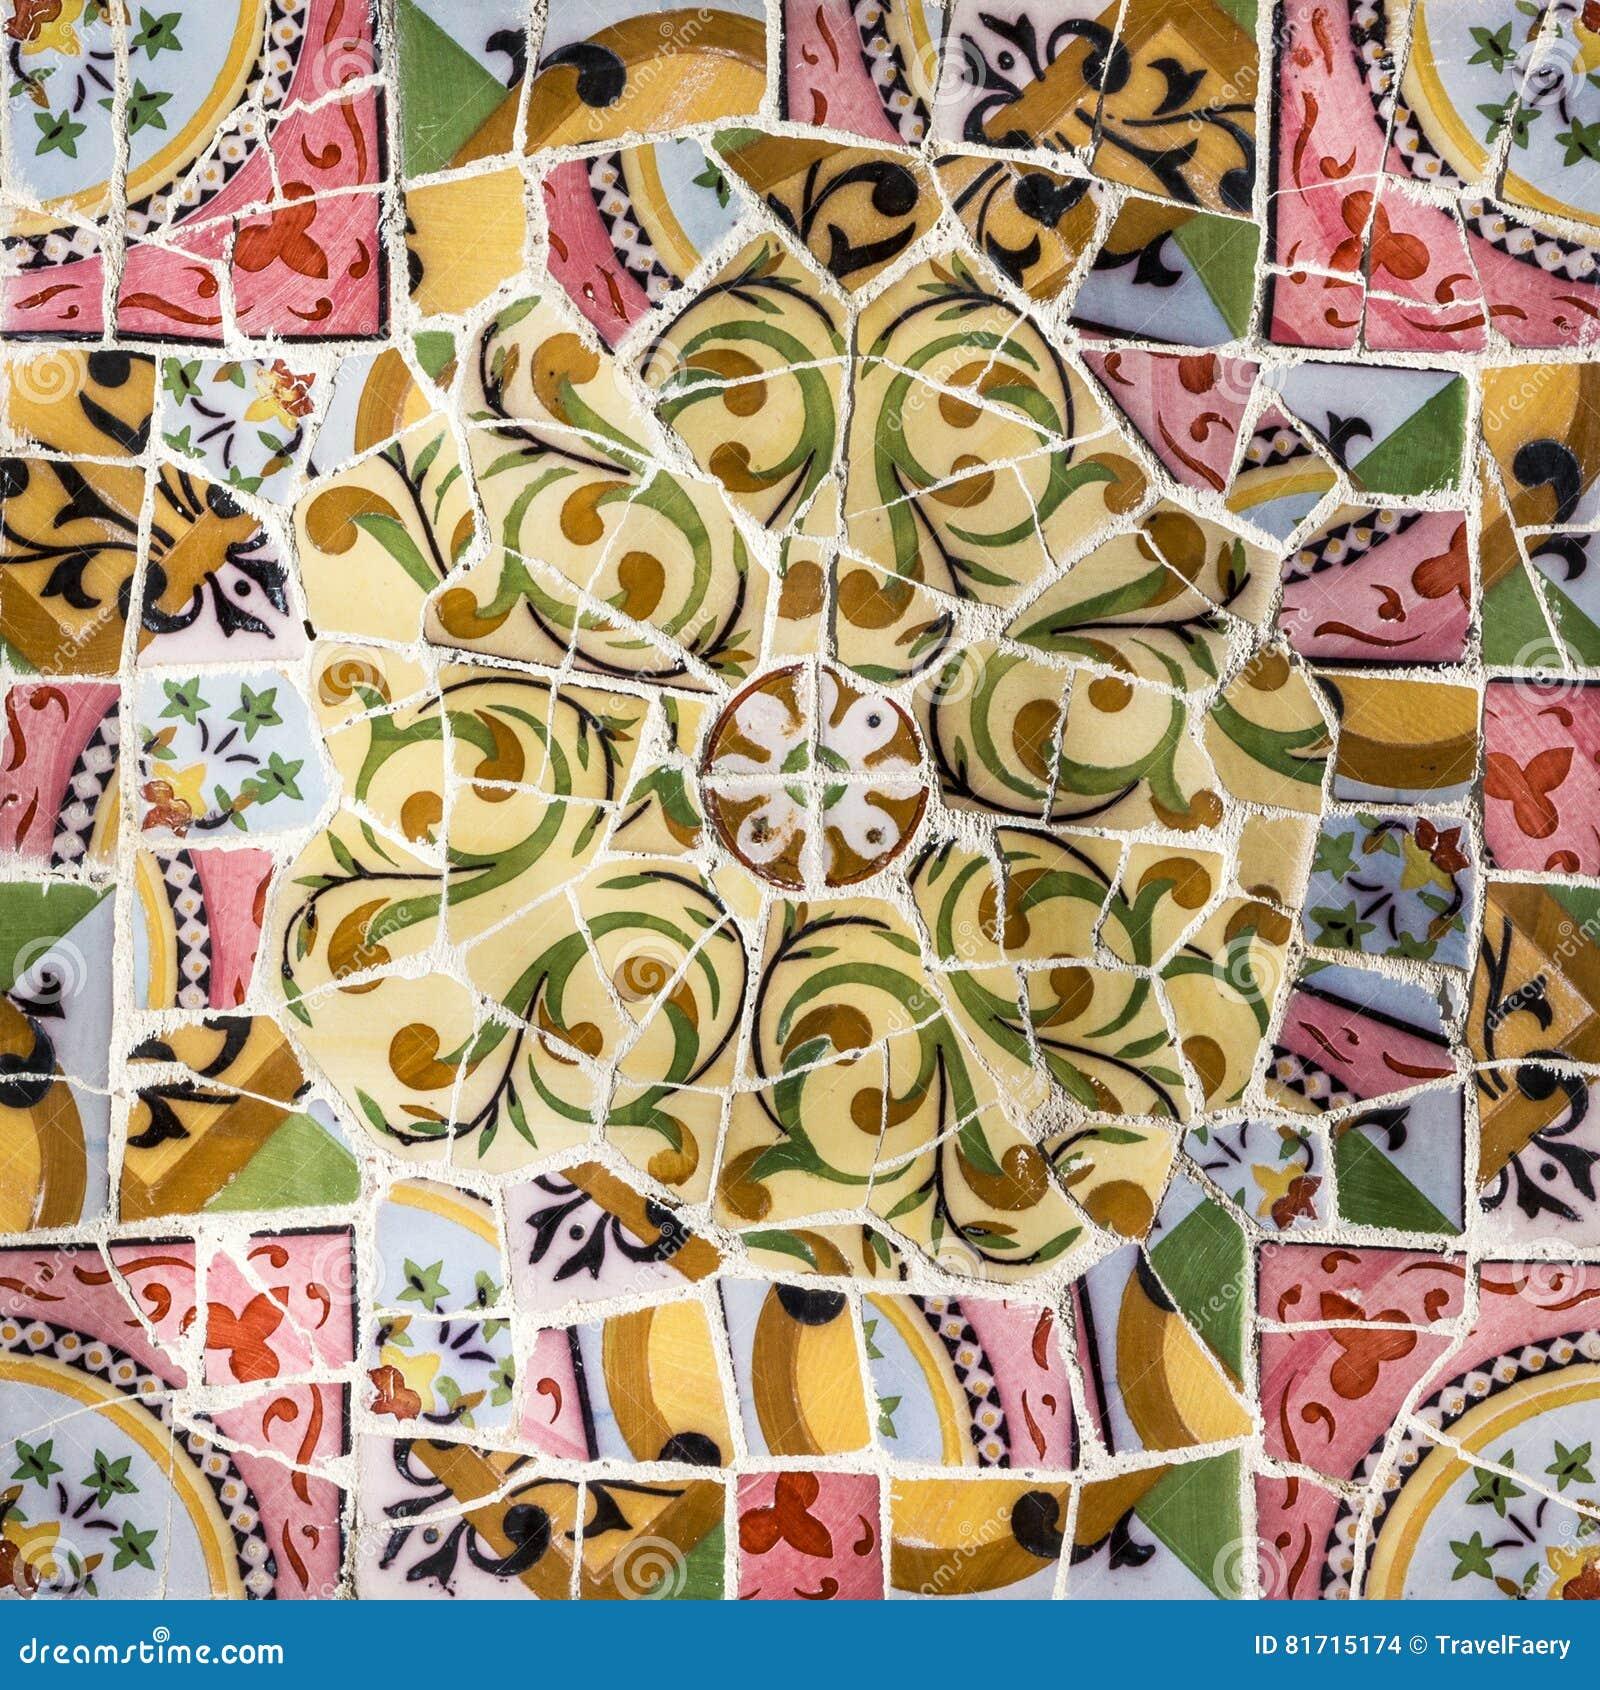 Glass mosaic ceramic tile decoration in park guell barcelona glass mosaic ceramic tile decoration in park guell barcelona royalty free stock photo download glass mosaic ceramic tile dailygadgetfo Images